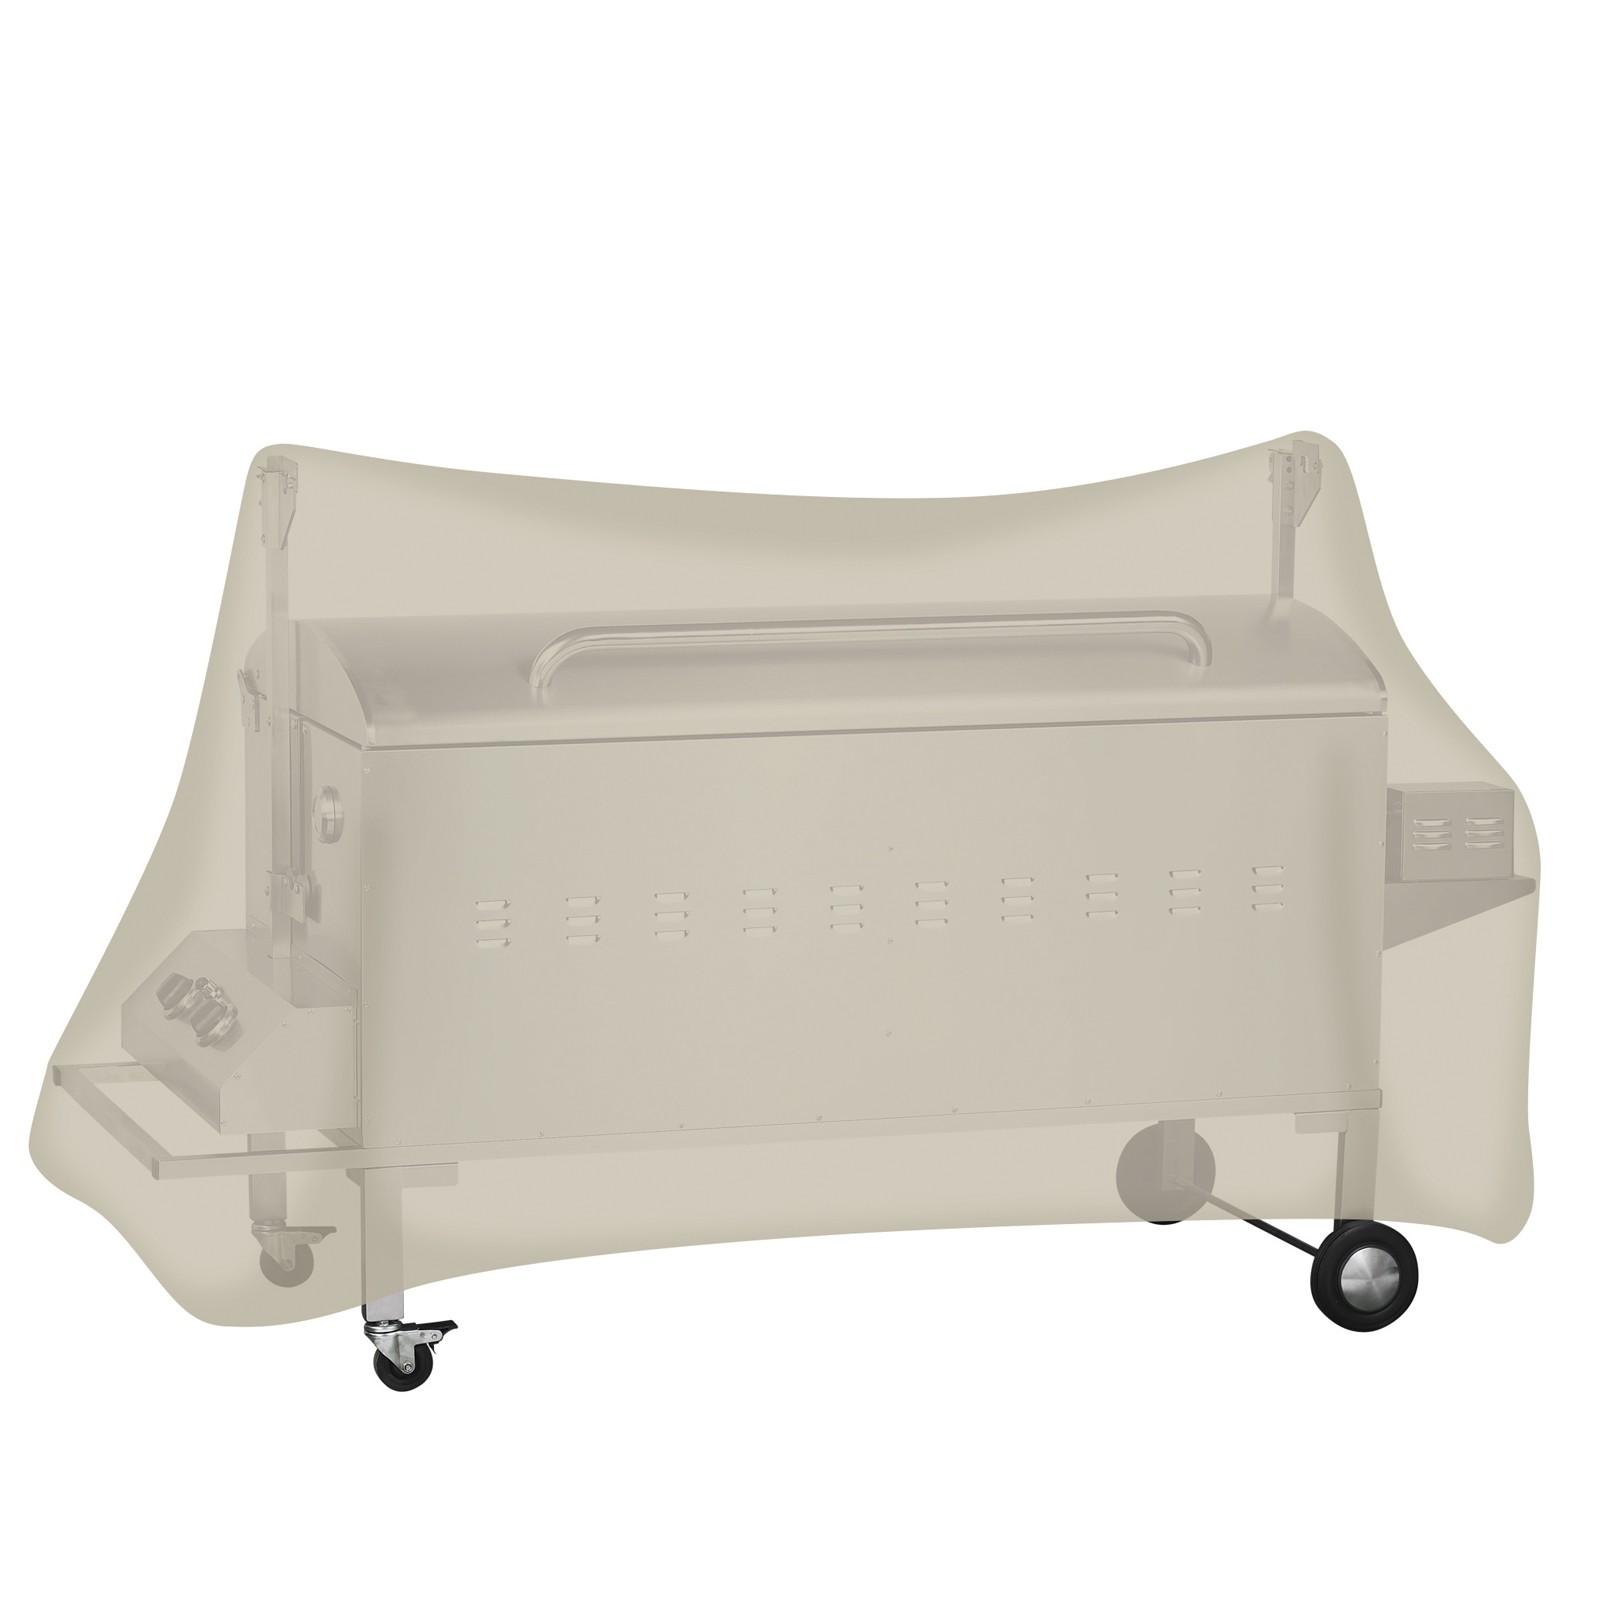 tepro universal abdeckhaube schutzh lle abdeckplane f r spanferkelgrill columbus ebay. Black Bedroom Furniture Sets. Home Design Ideas